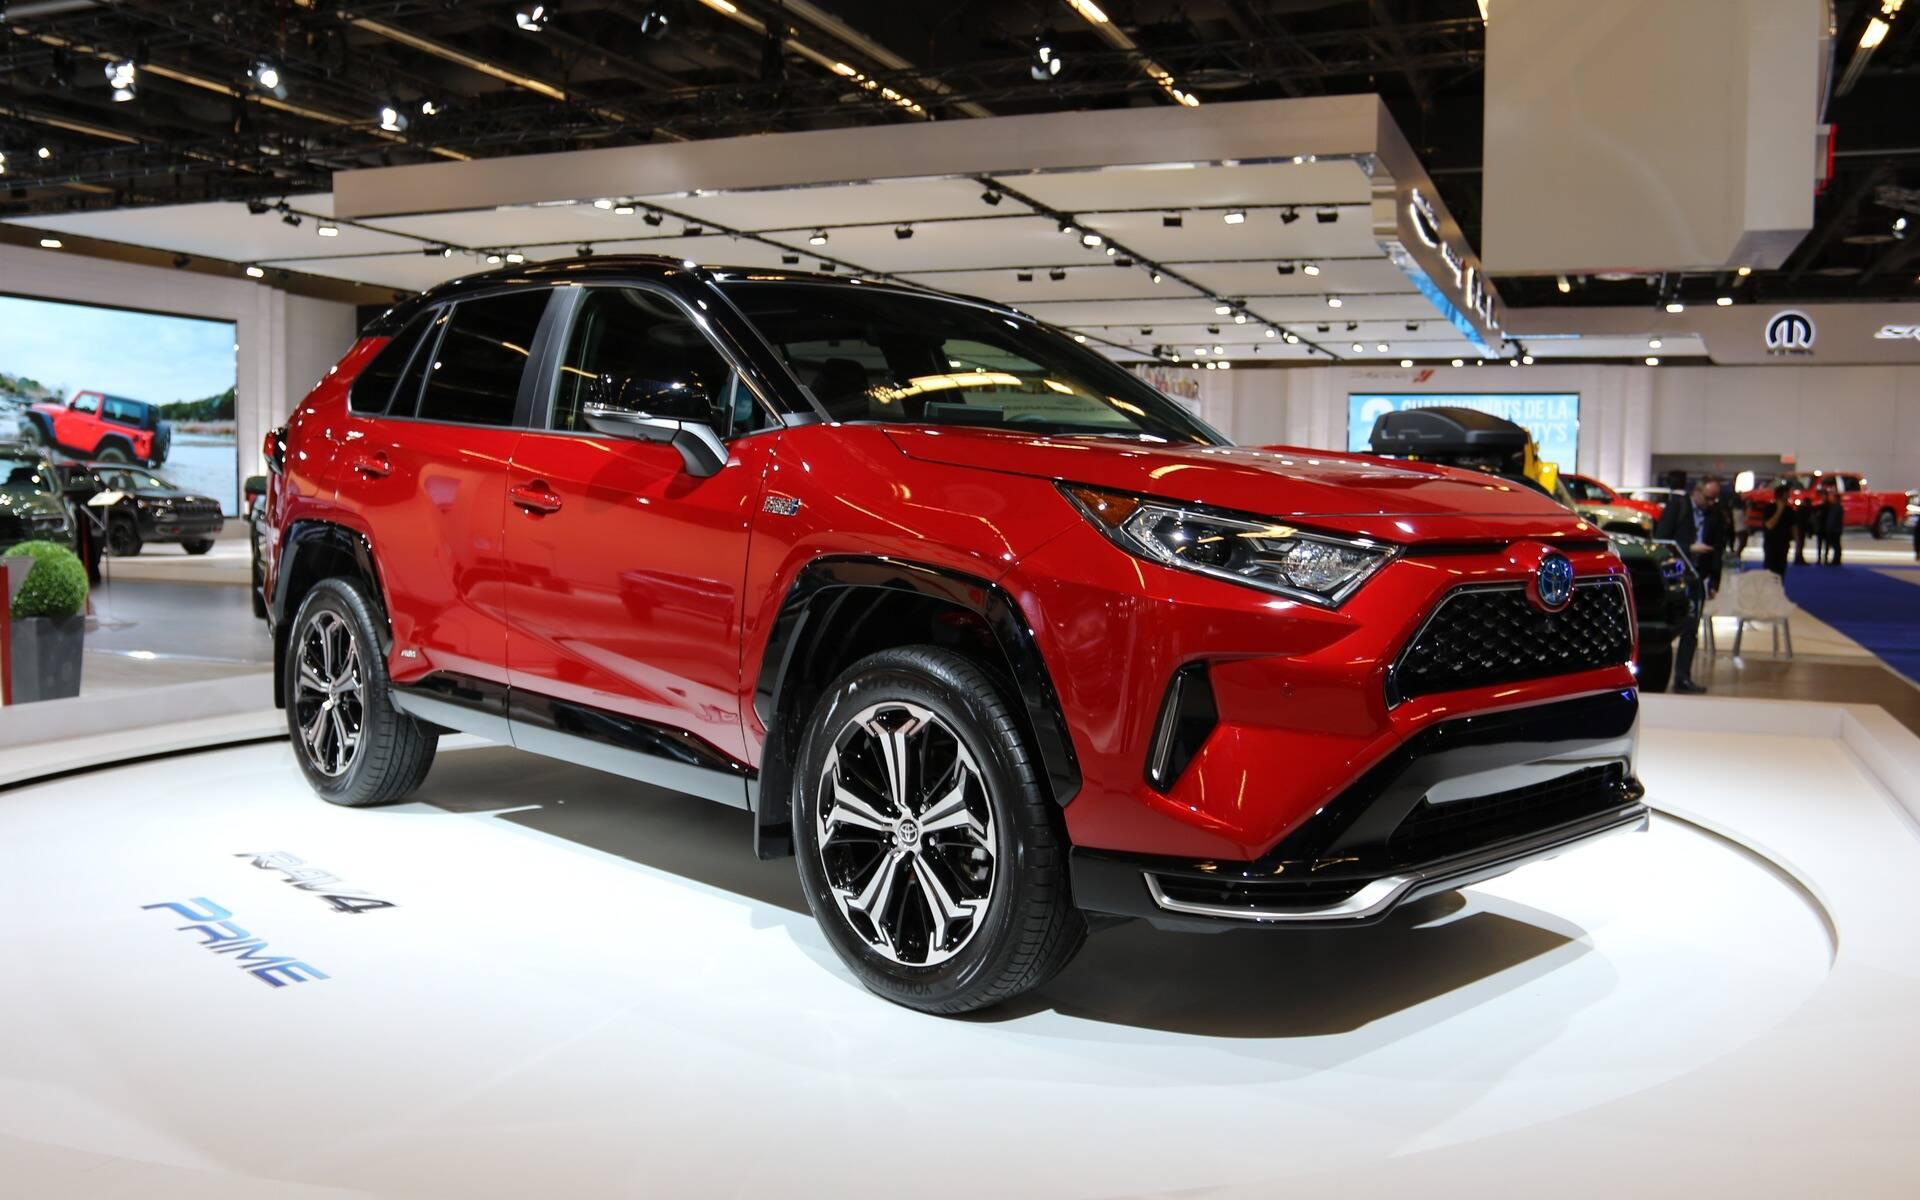 2021 Toyota Rav4 Prime Comes With Big Ev Rebates The Car Guide